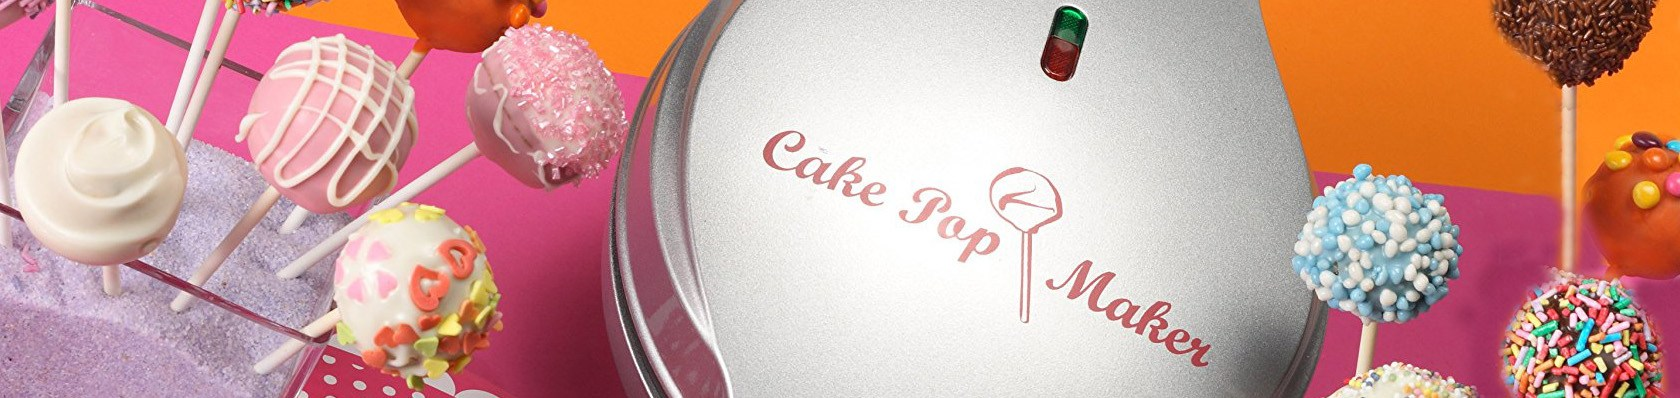 Cake Pop Makers im Test auf ExpertenTesten.de